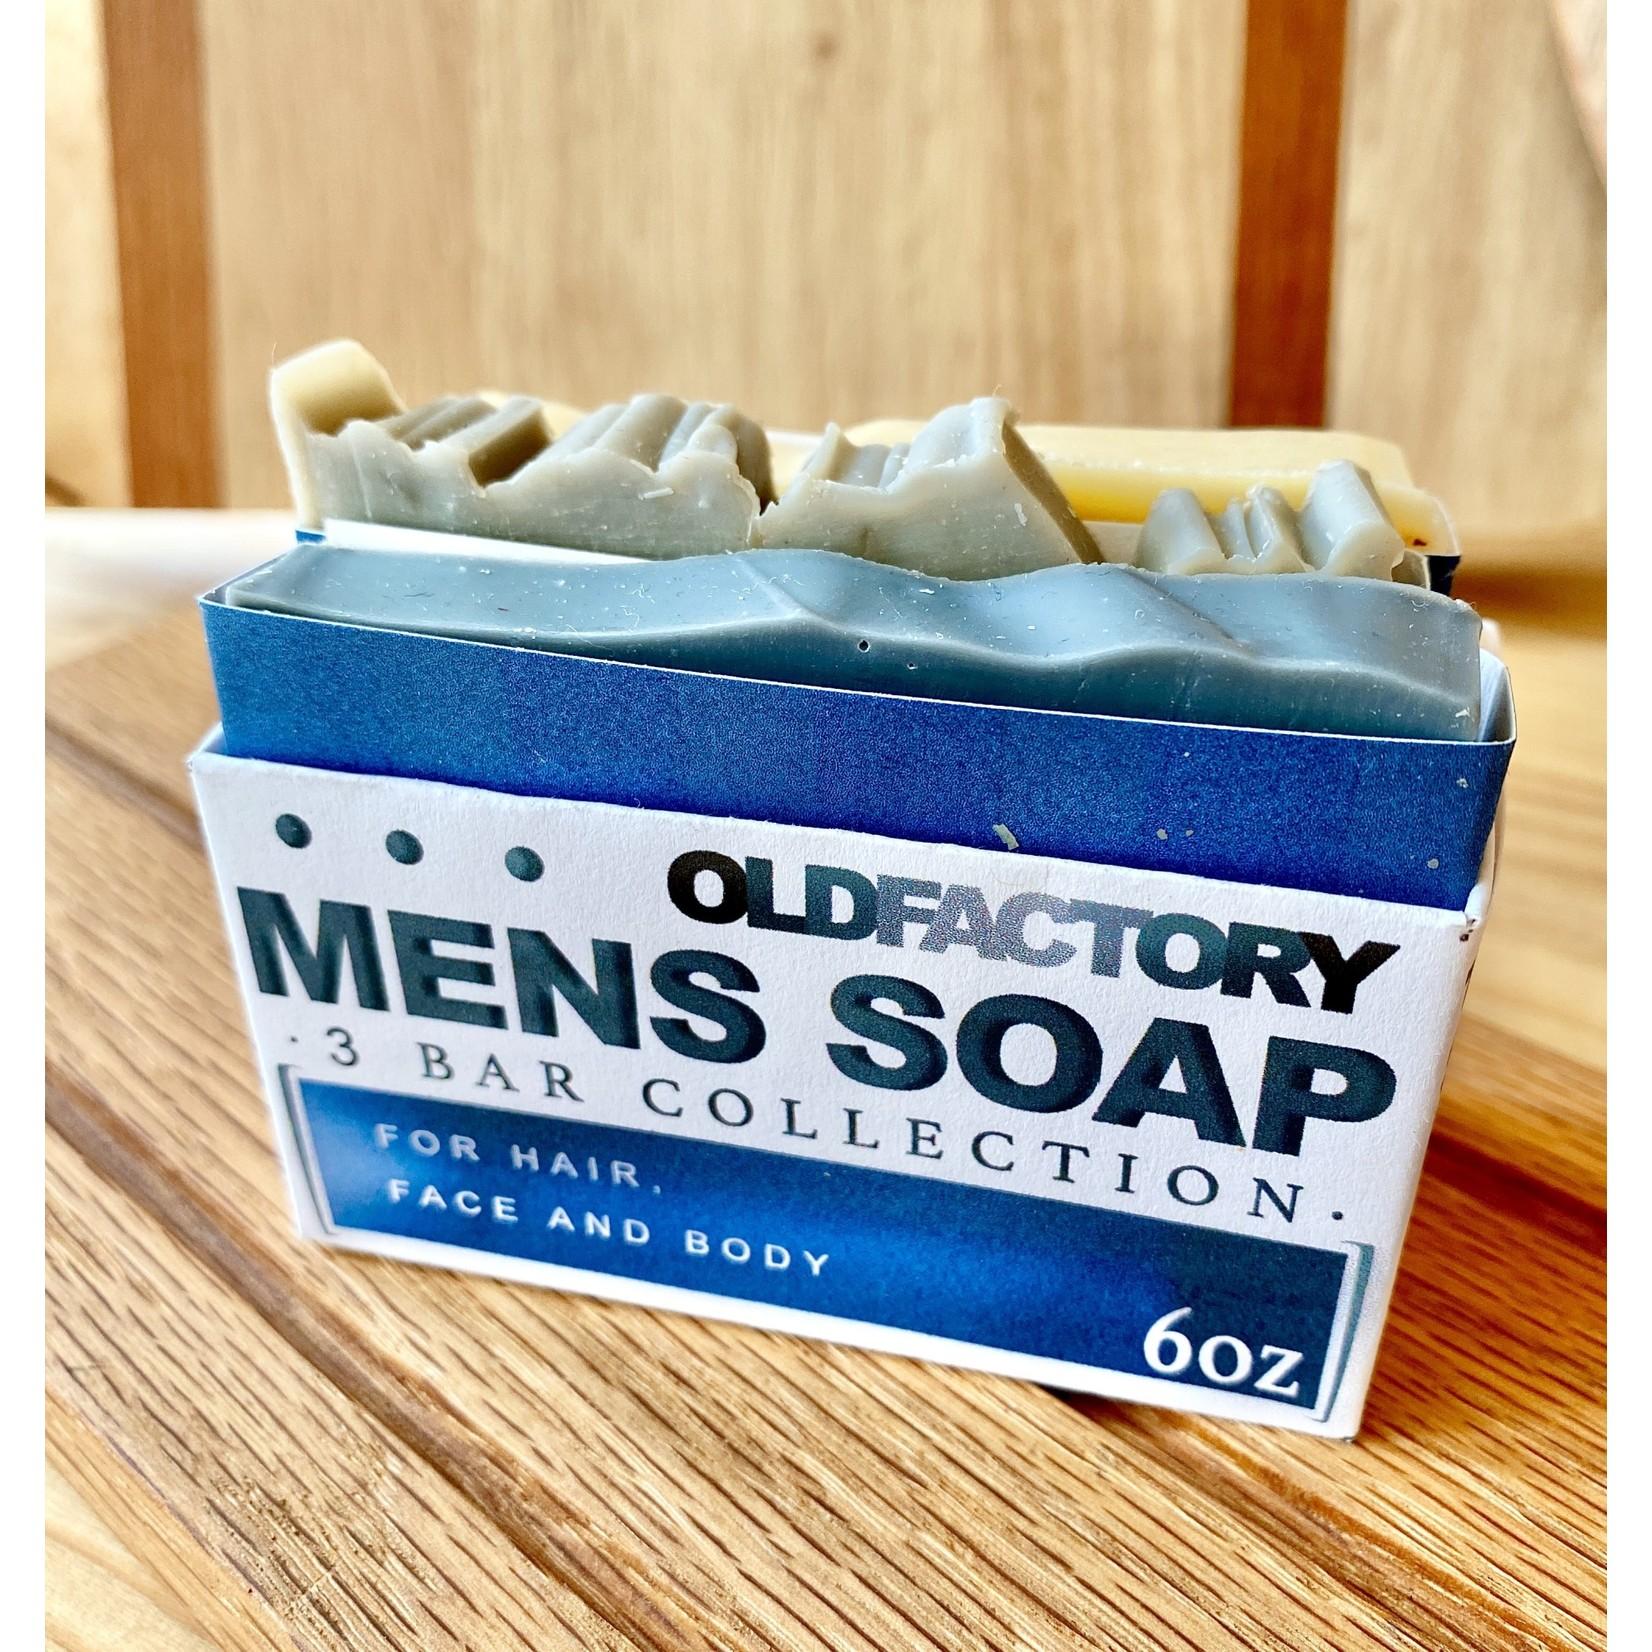 Old Factory Soap Company Men's Soap Sampler: 3 Bar Collection